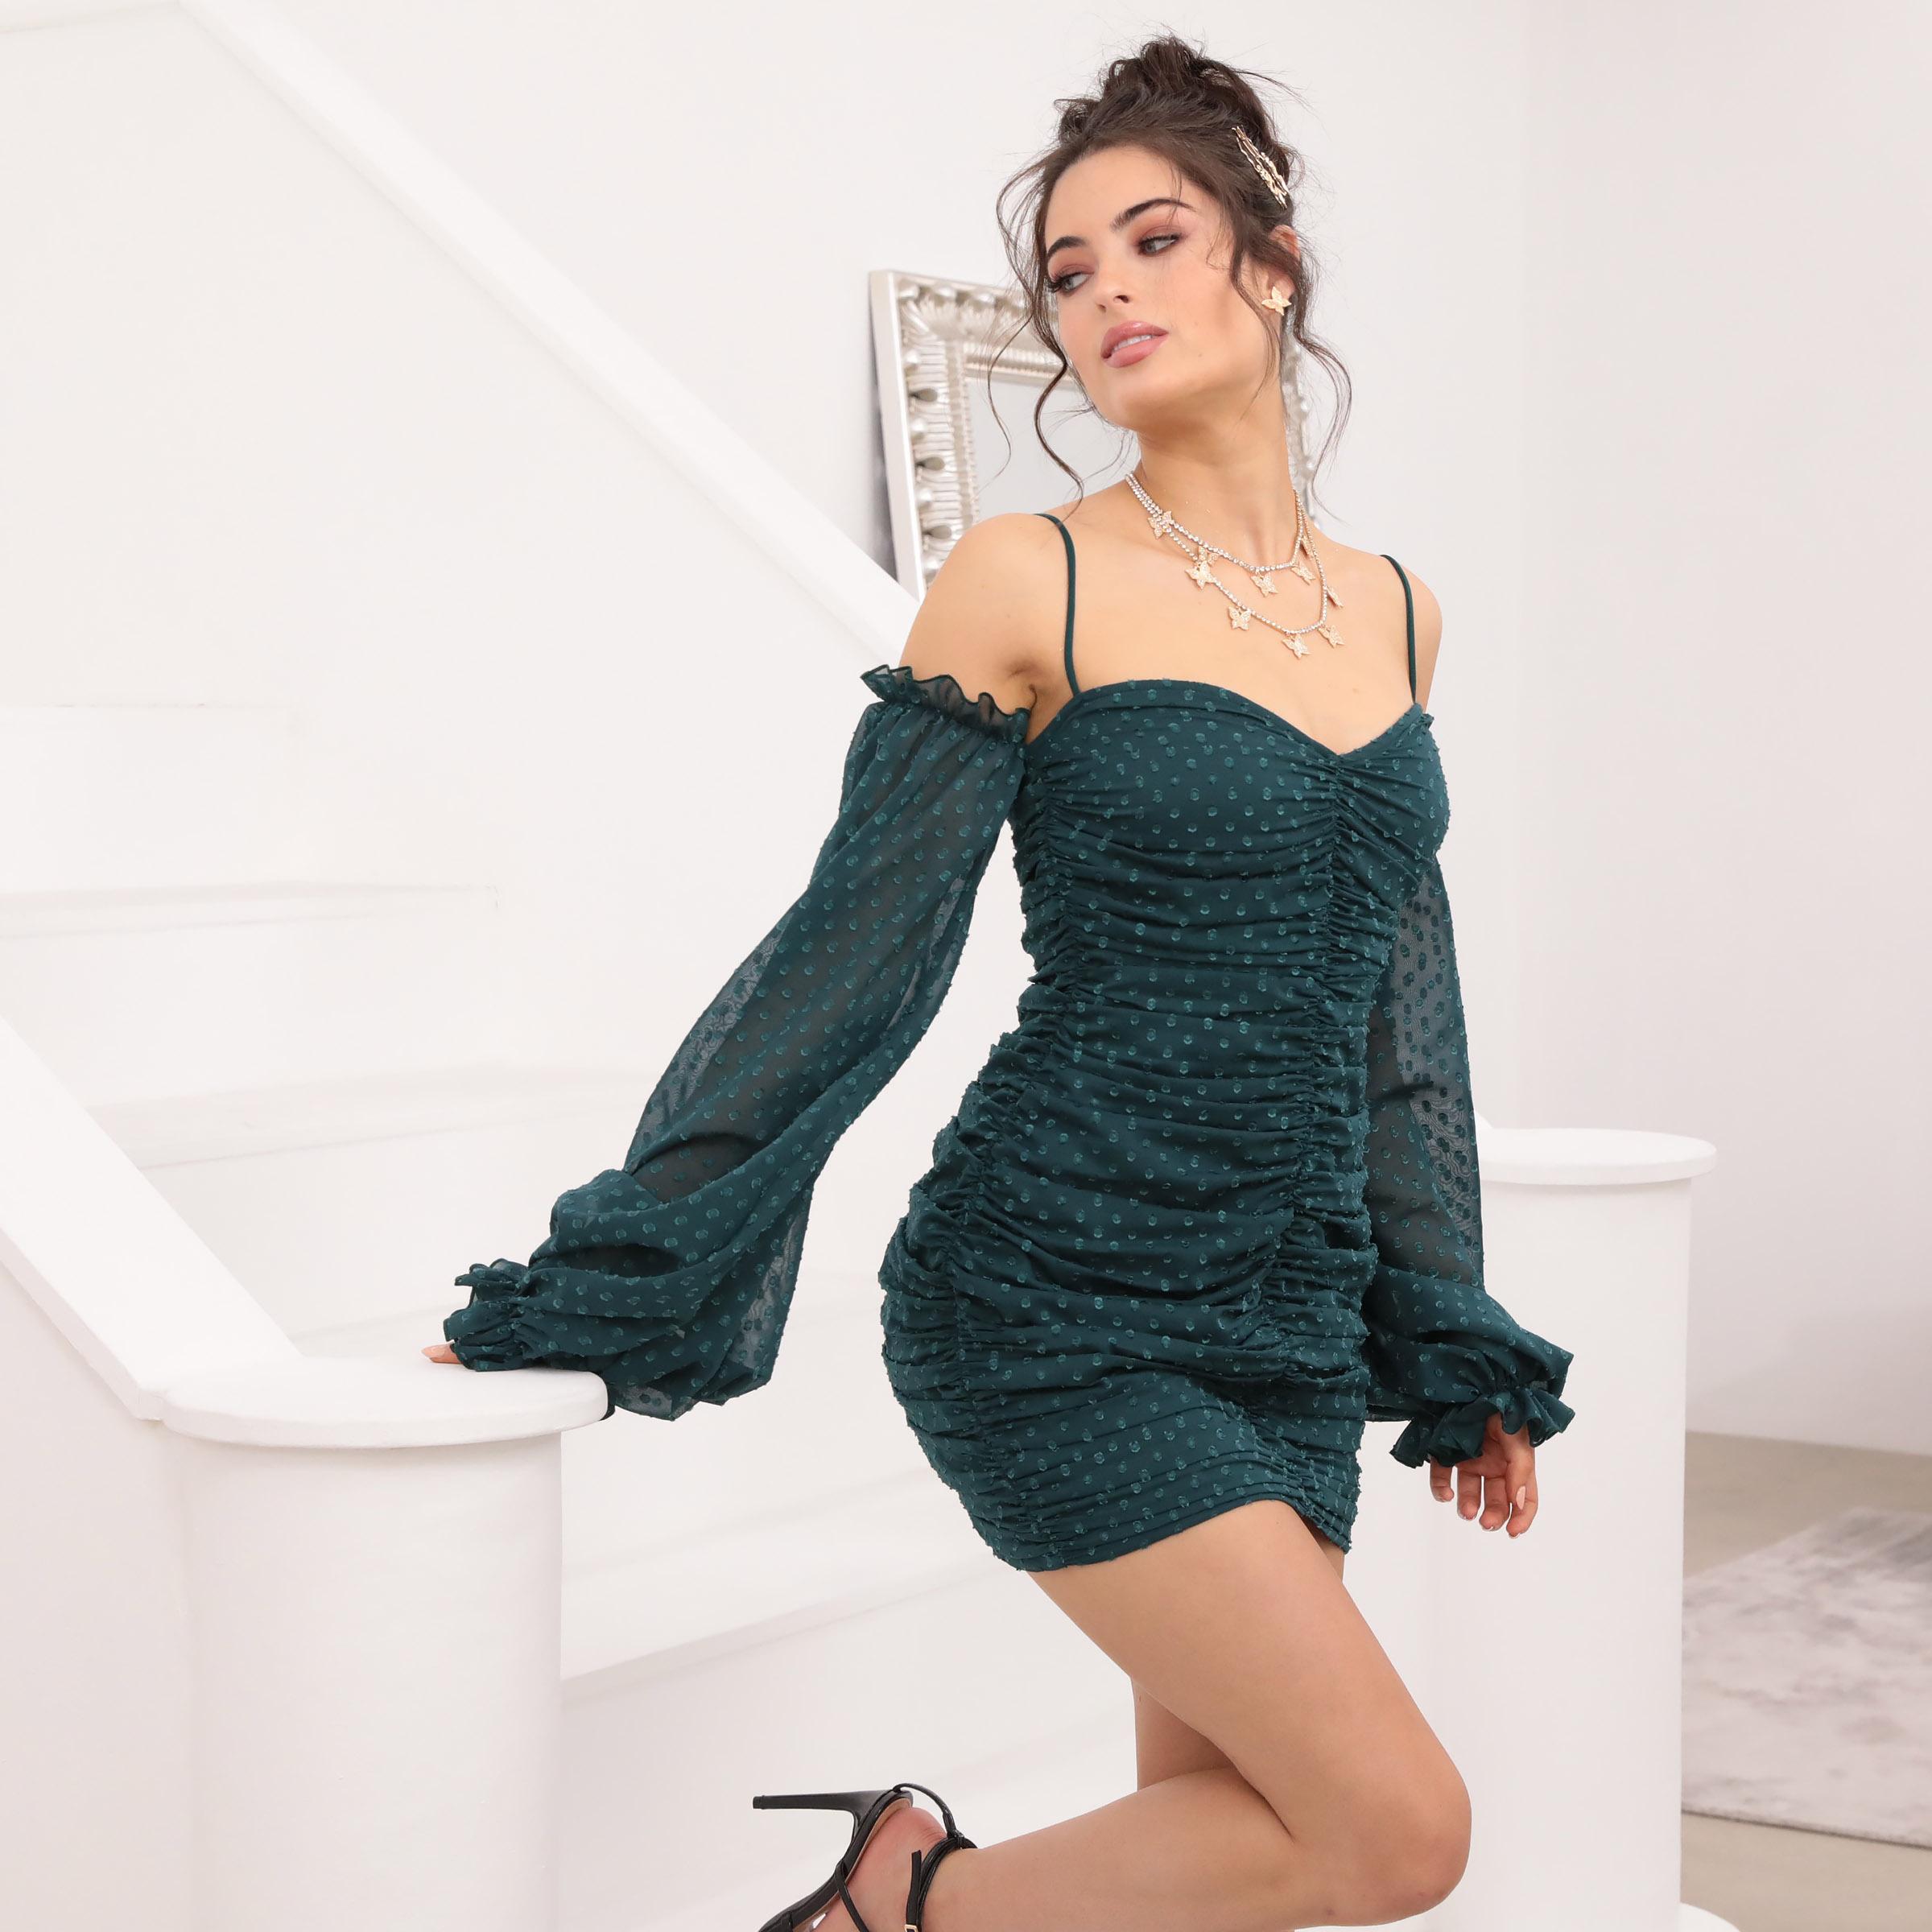 Natalia Draped Dress in Dotted Emerald Chiffon